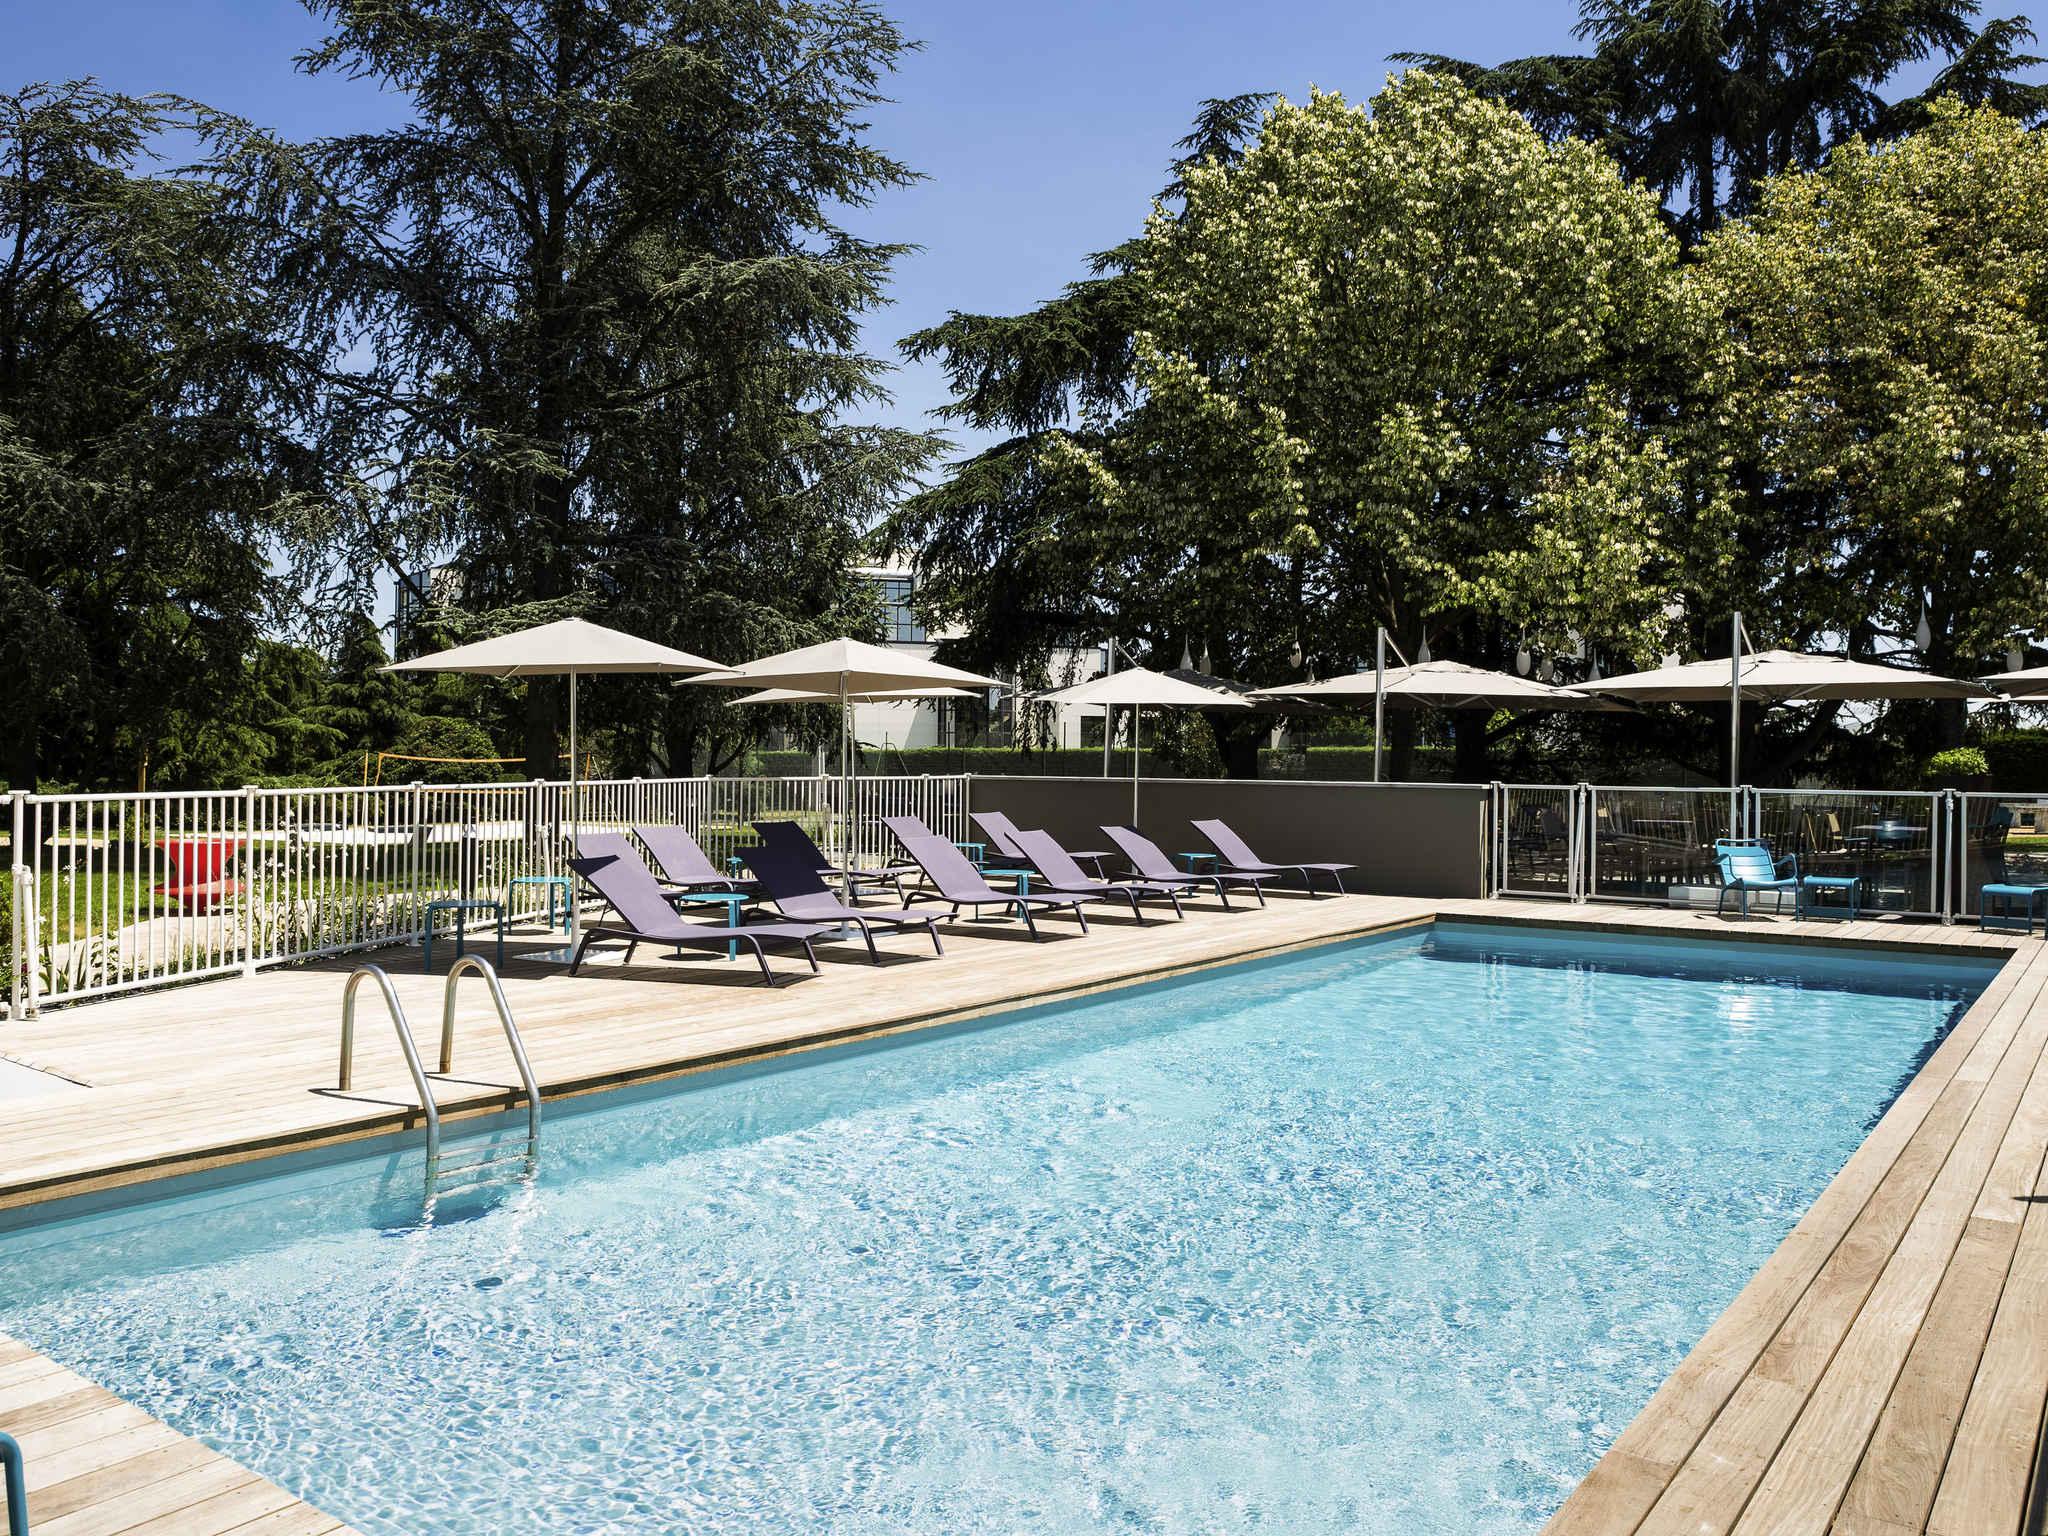 Hotel in TOULOUSE - Novotel Toulouse Purpan Airport a9b0e34b74de